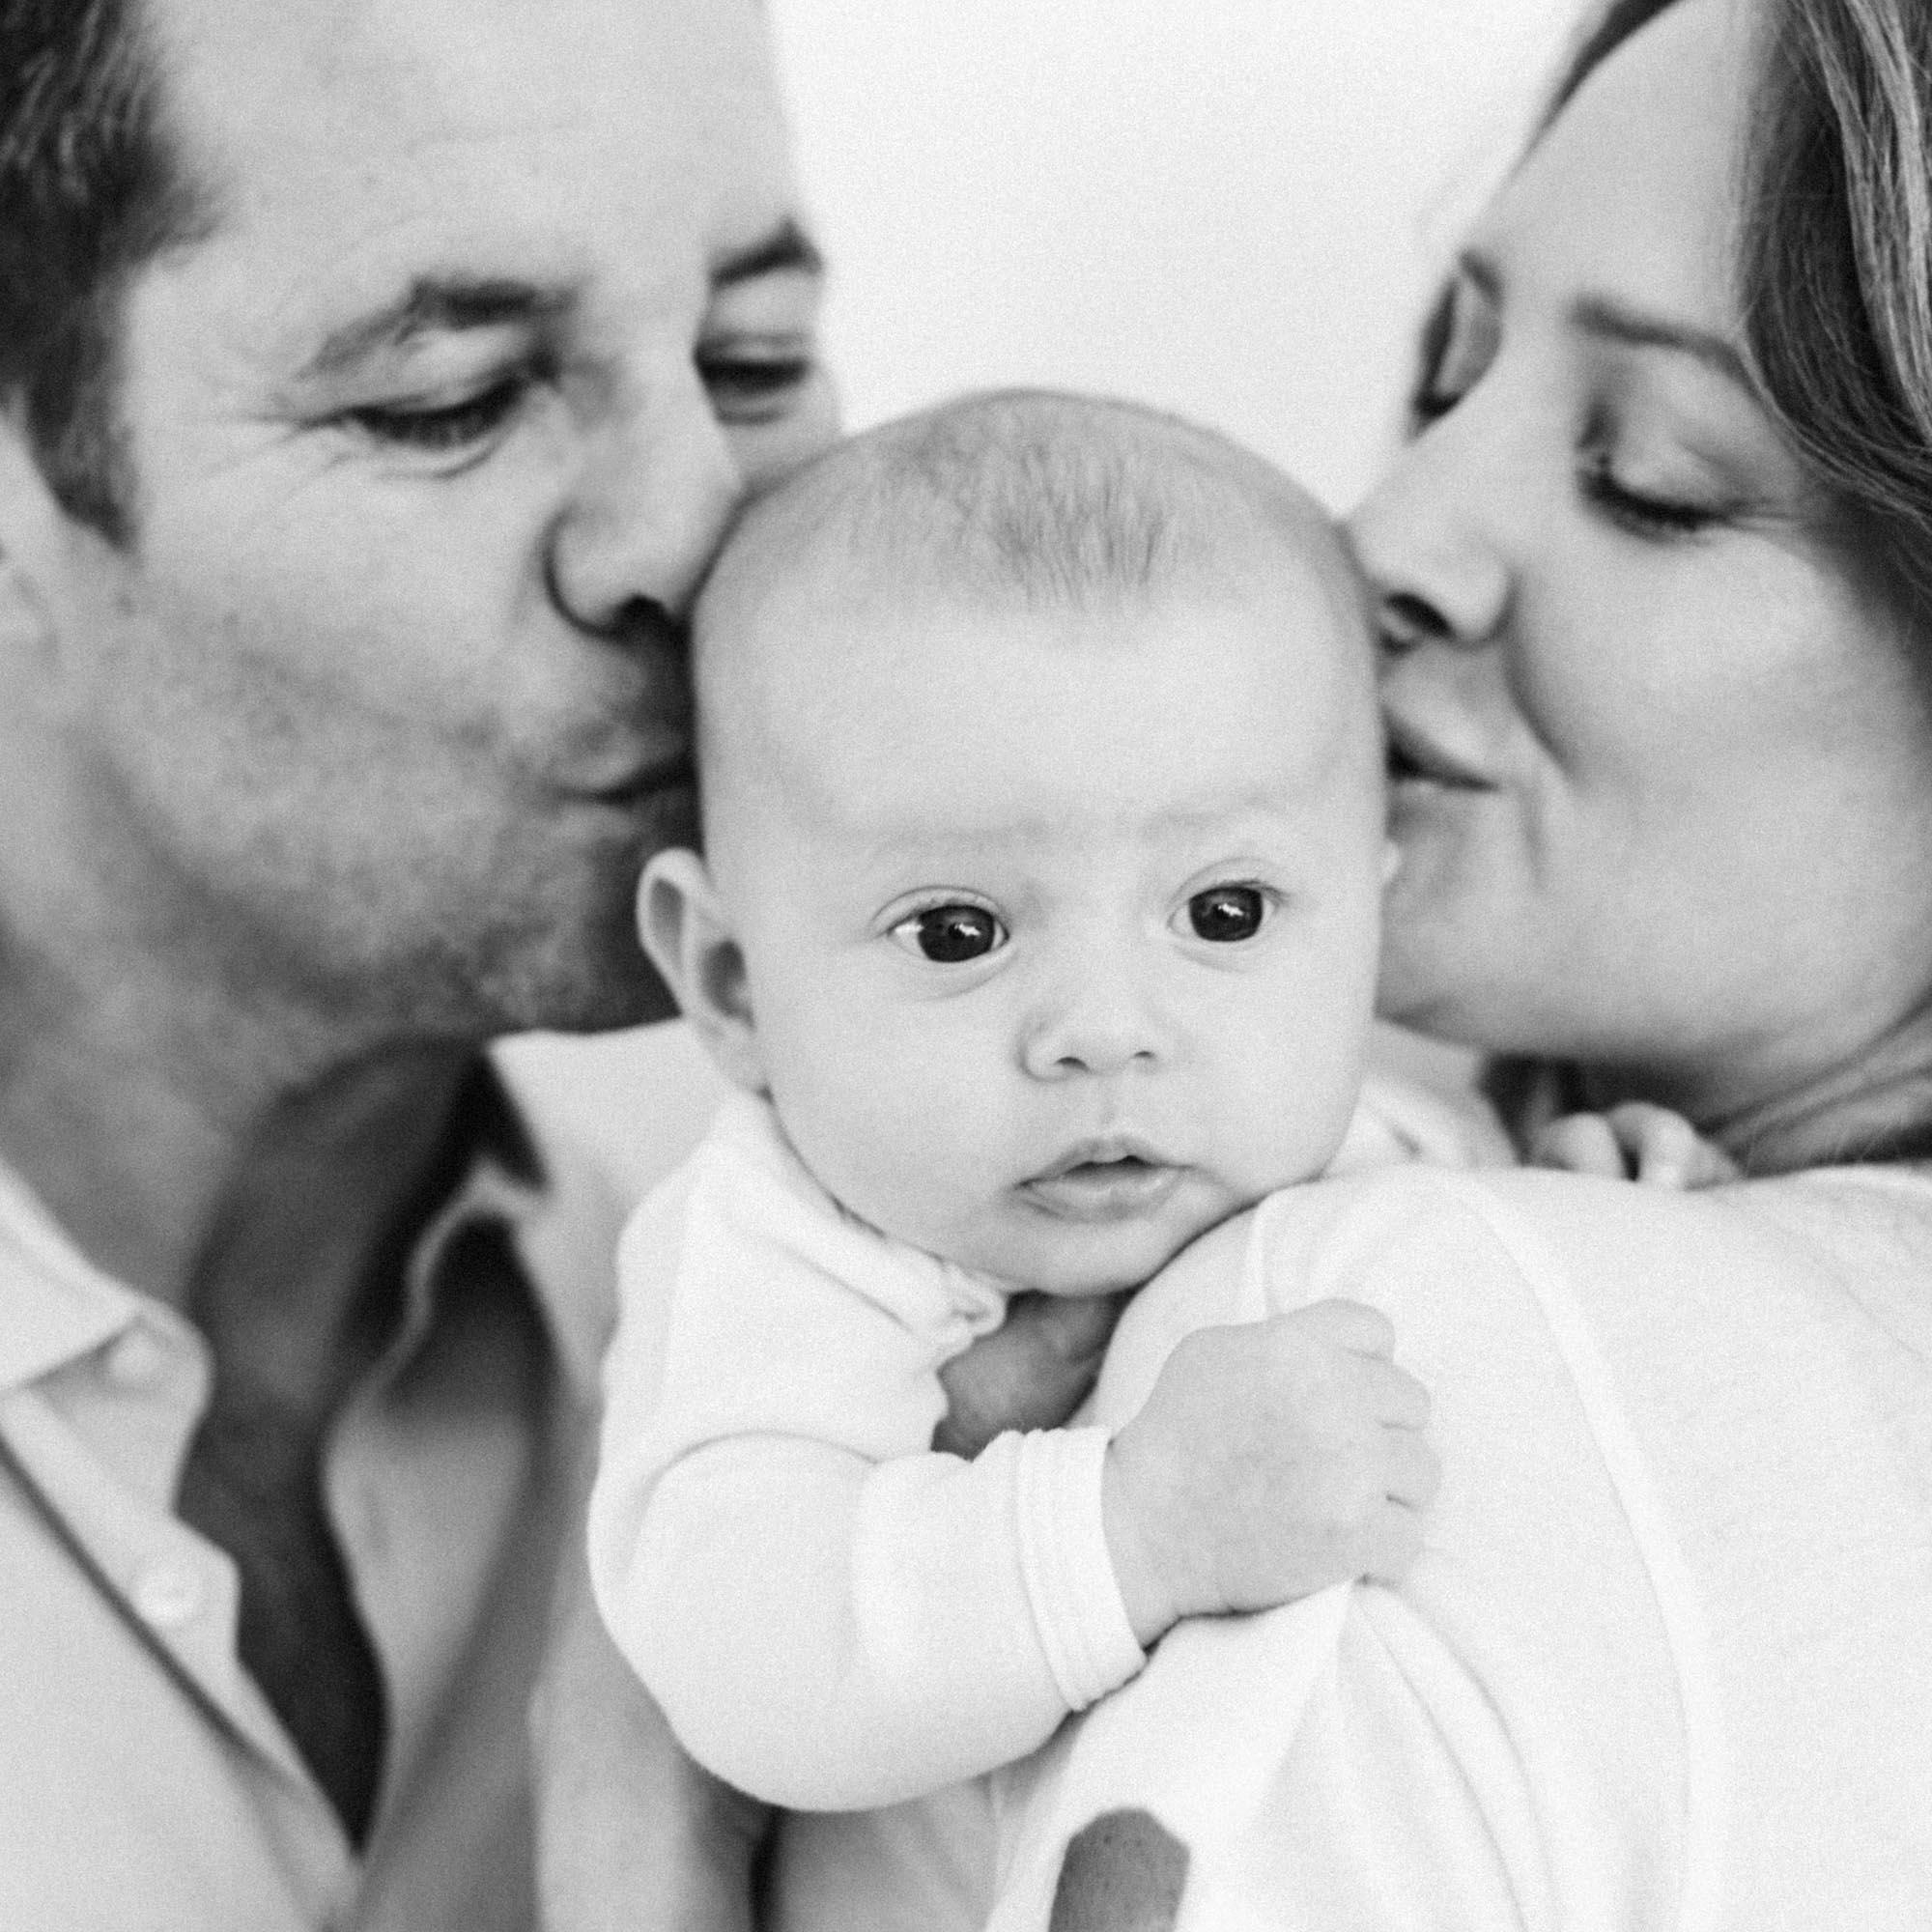 nyc-photographers-FAMILY-PHOTOSHOOT-10031.jpg